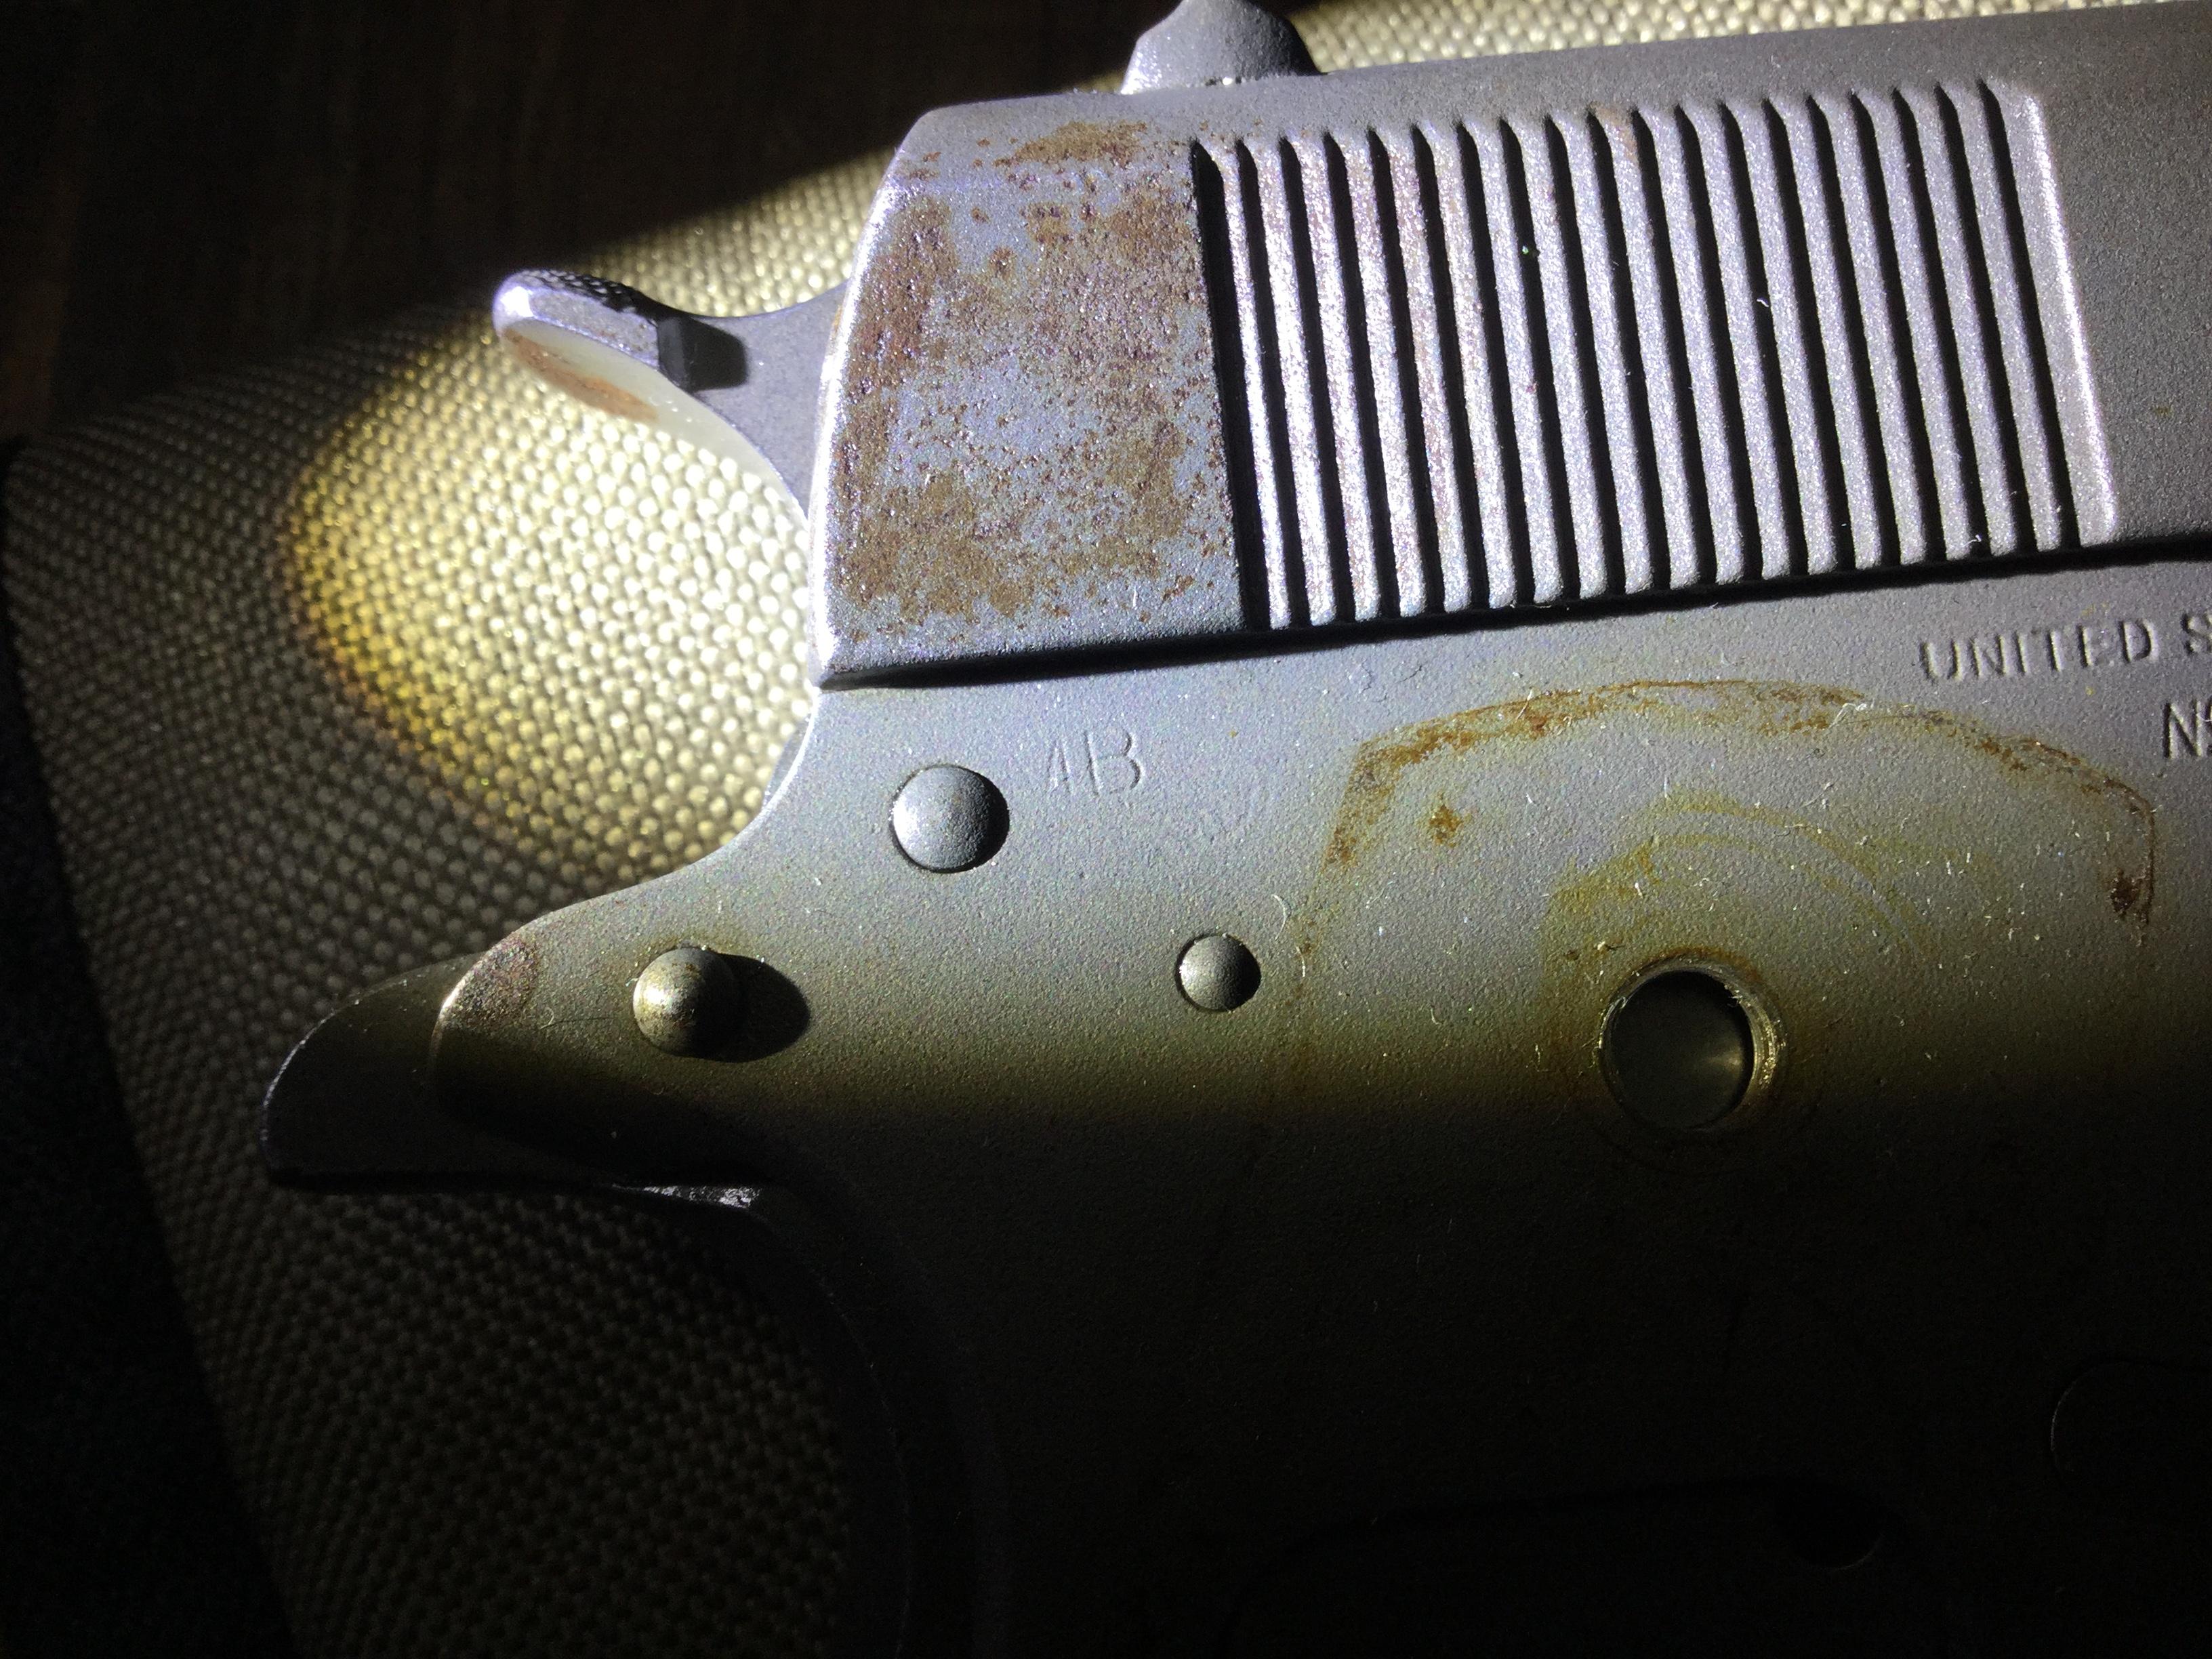 1944 Colt 1911a1 markings? New pics  LEAD arsenal?